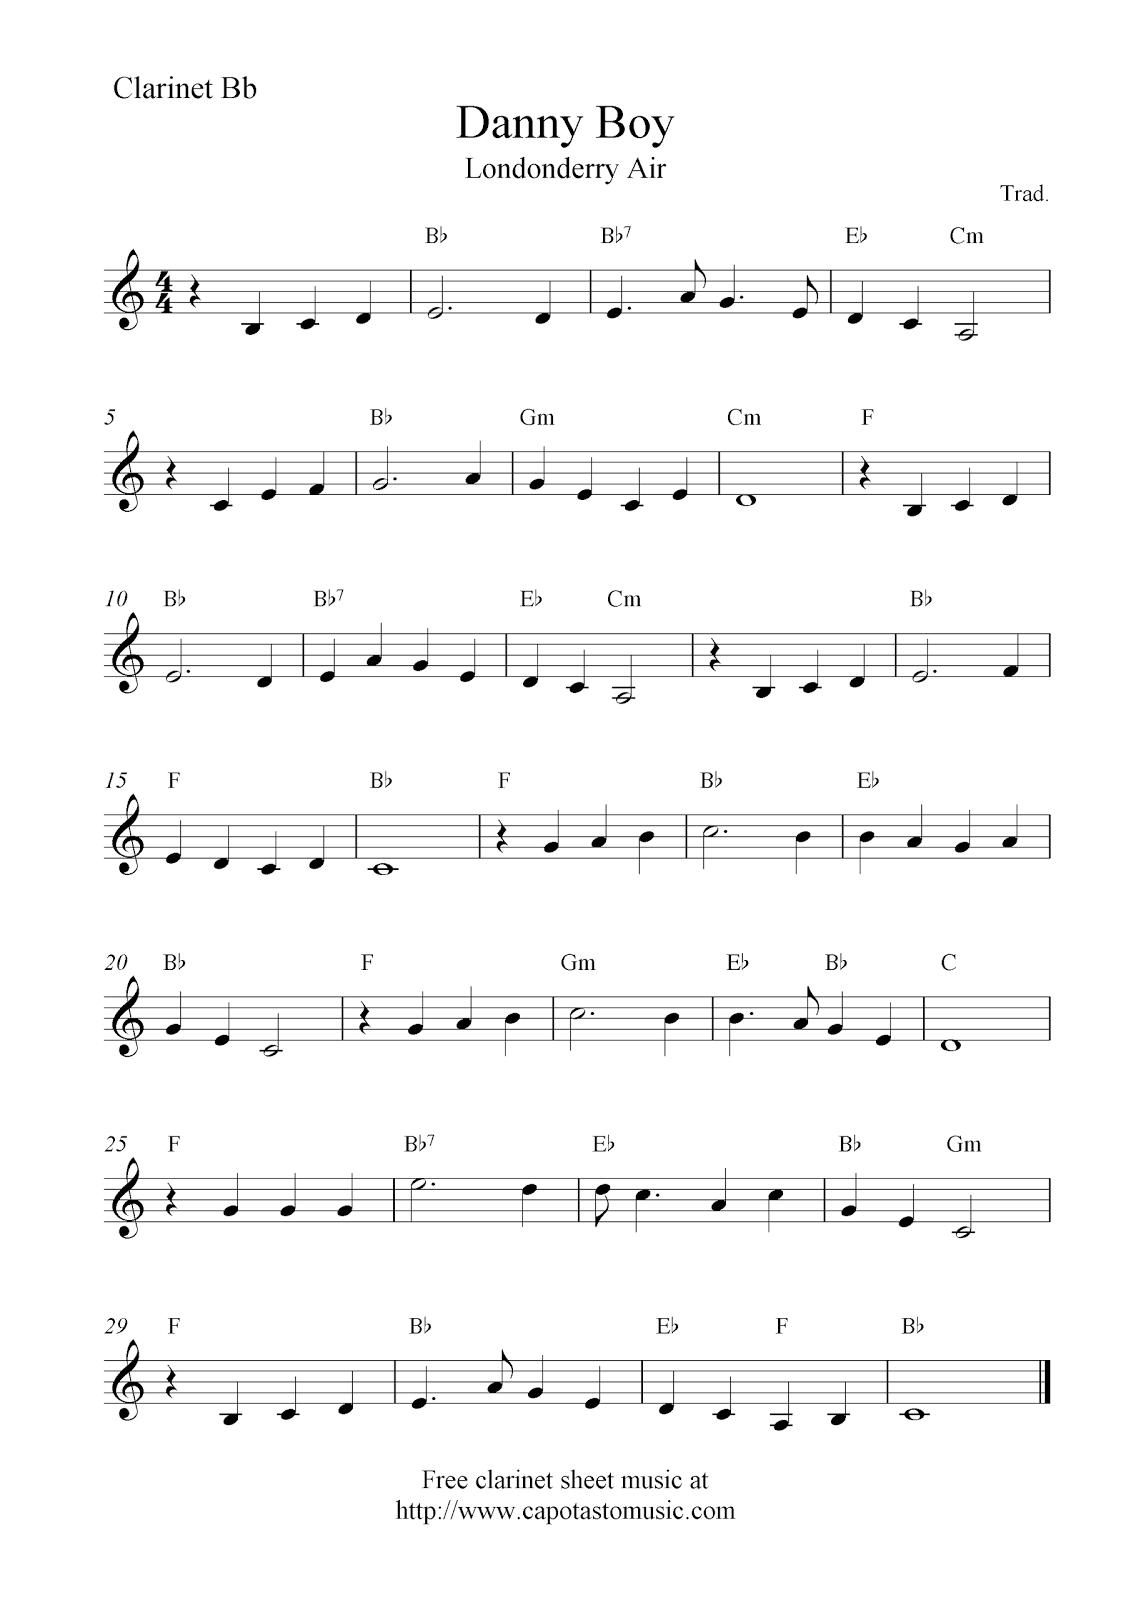 Danny Boy (Londonderry Air), Free Clarinet Sheet Music Notes - Free Sheet Music For Clarinet Printable